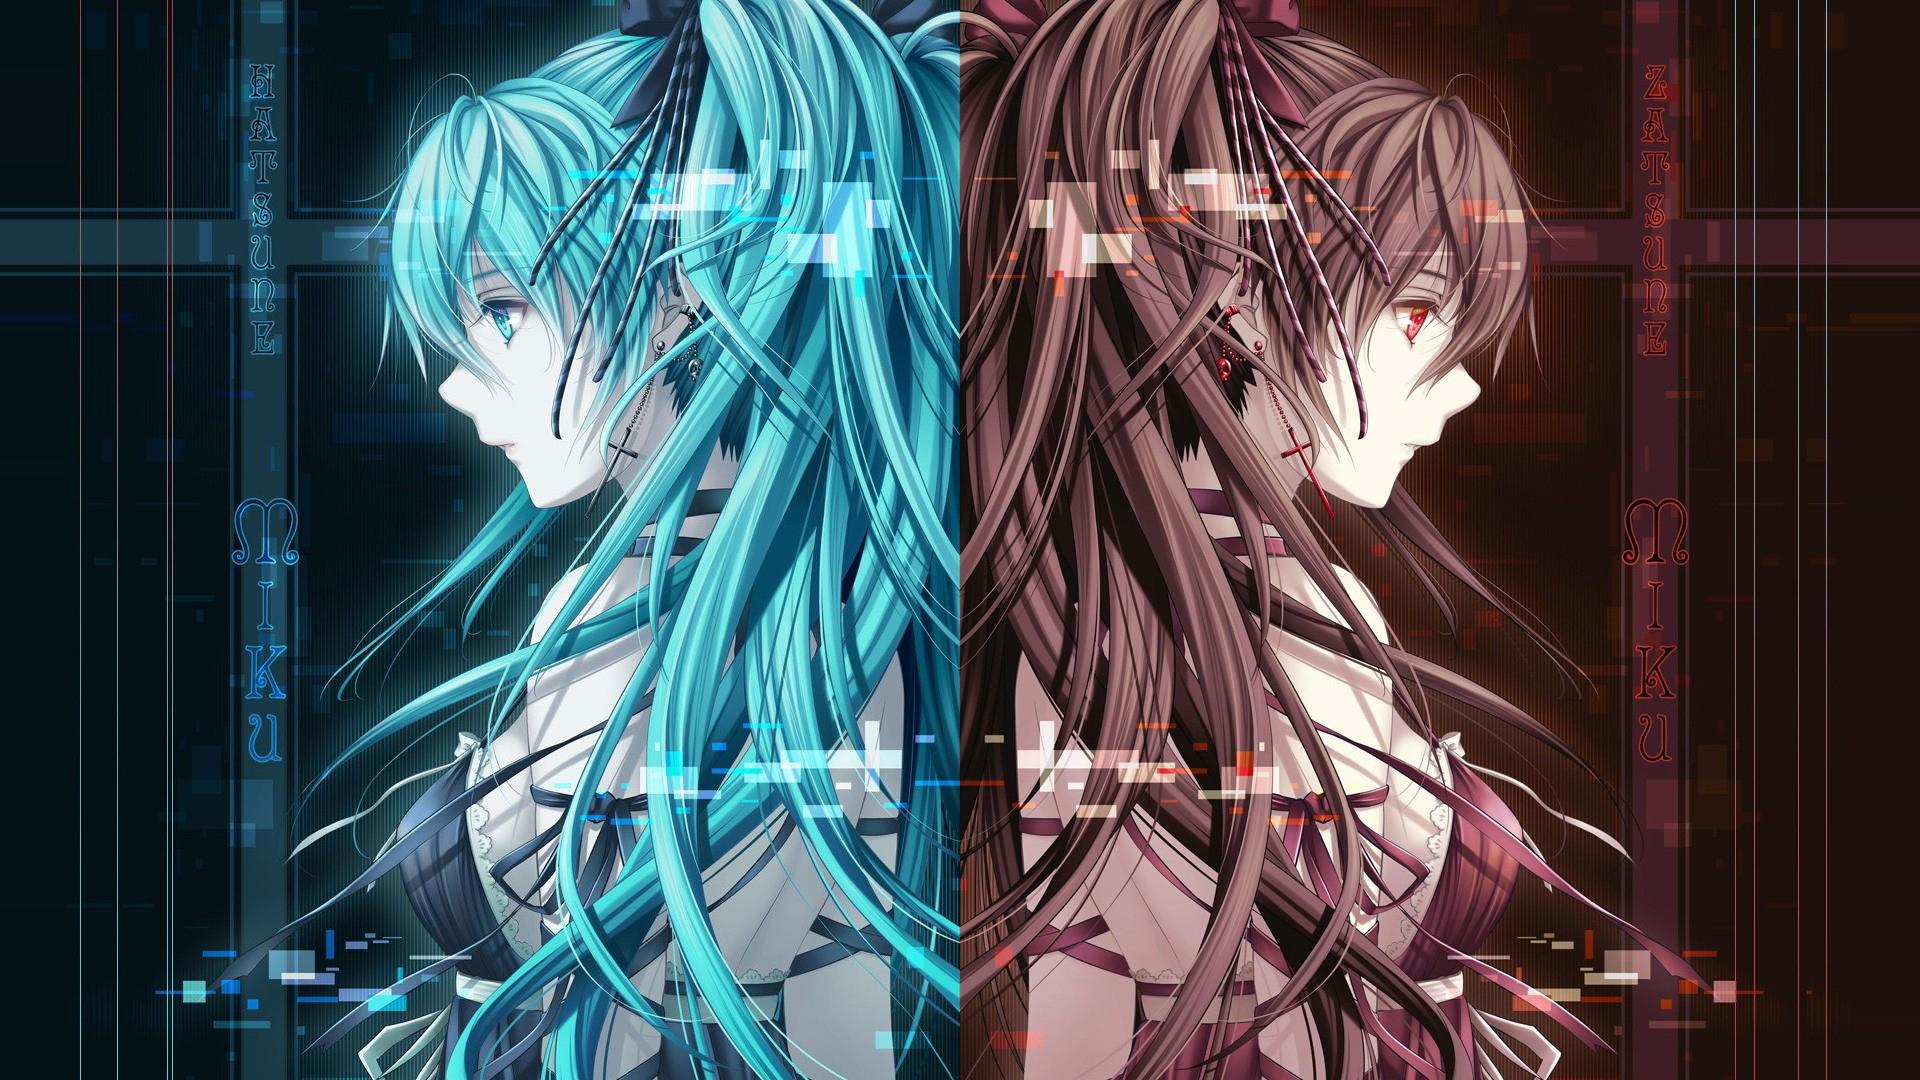 Free Download Anime Computer Wallpapers Desktop Backgrounds